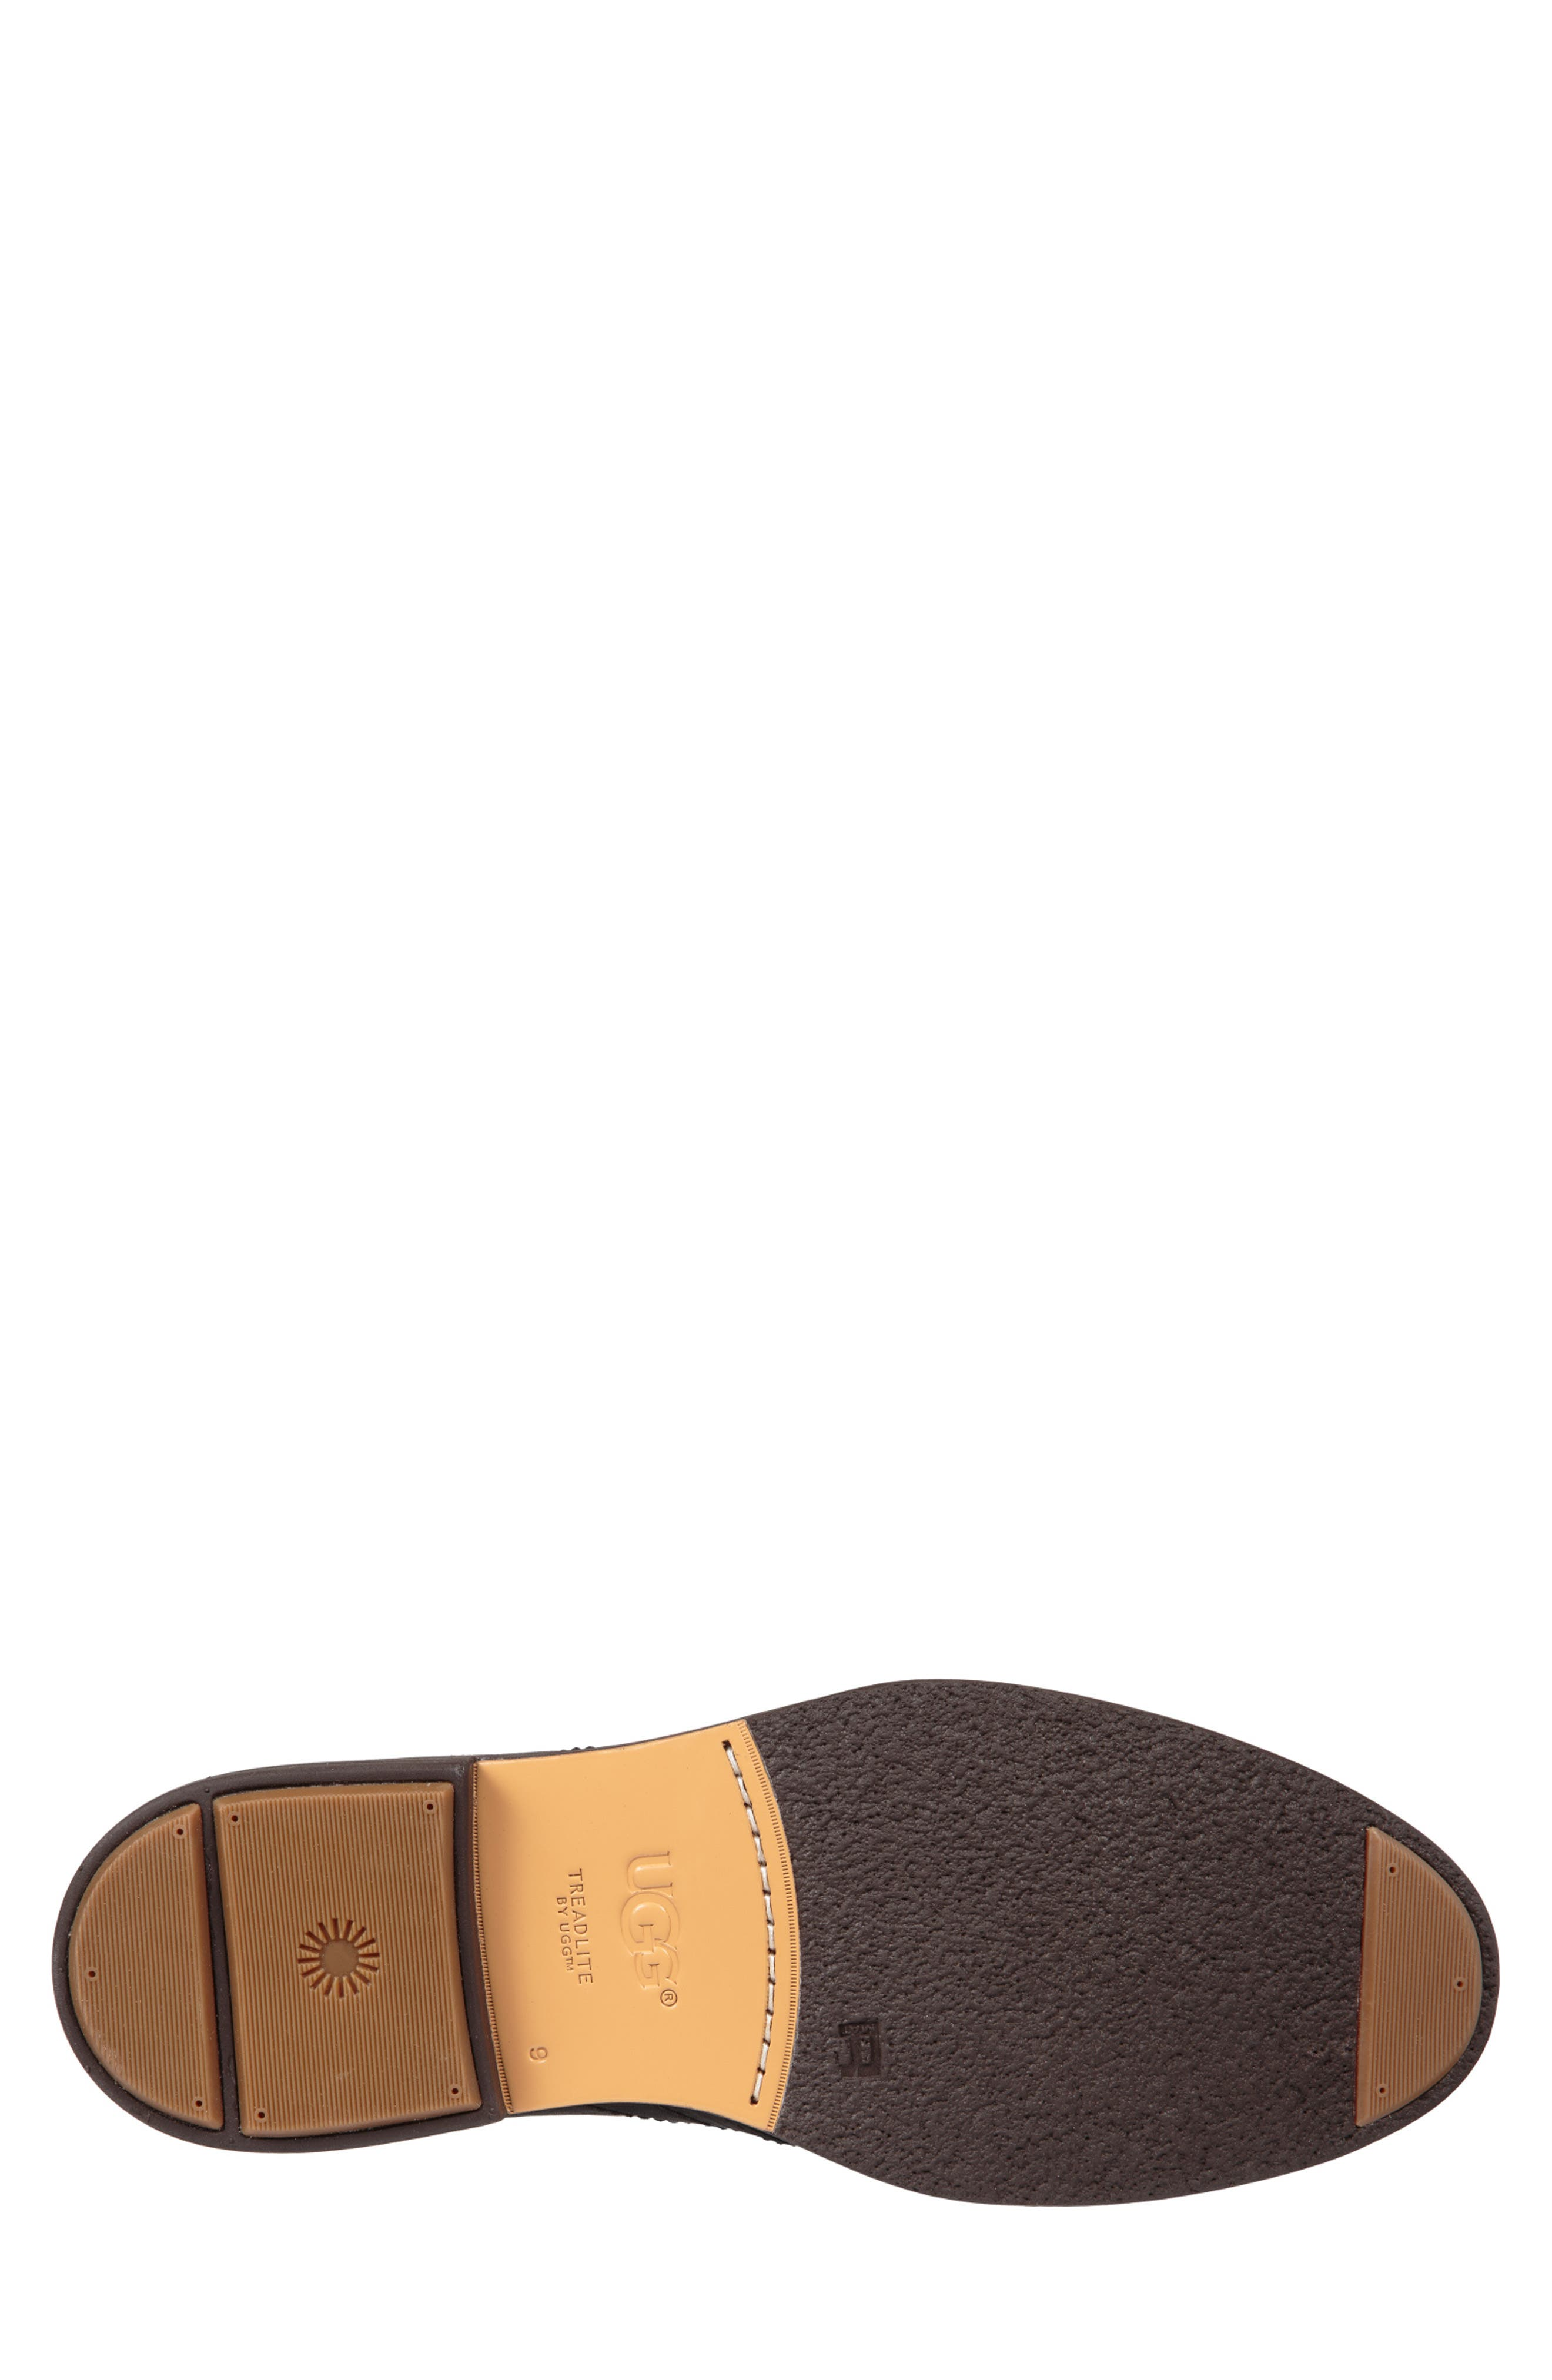 Australia Dagmann Chukka Boot,                             Alternate thumbnail 5, color,                             BLACK LEATHER/SUEDE